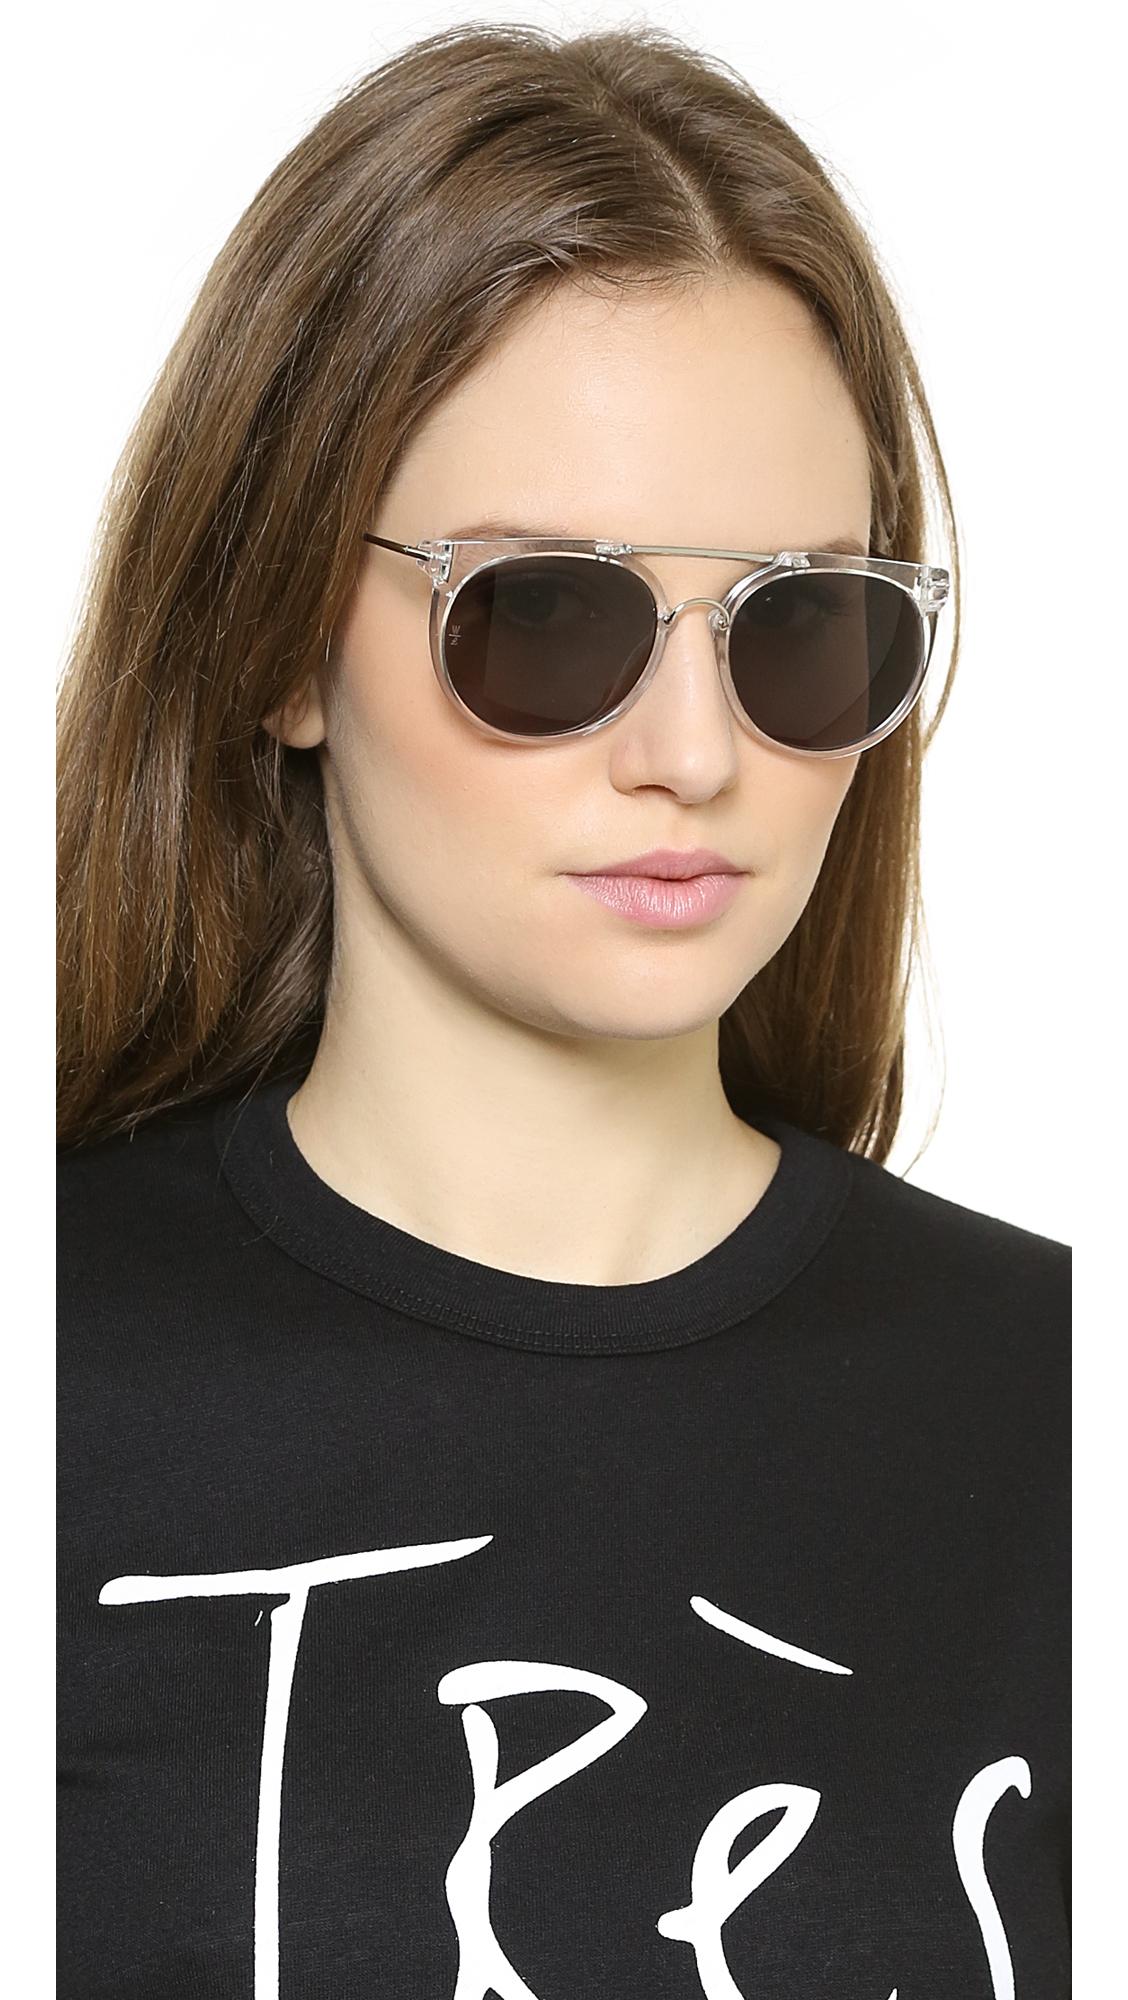 a19f5387ad Lyst - Wonderland Stateline Sunglasses